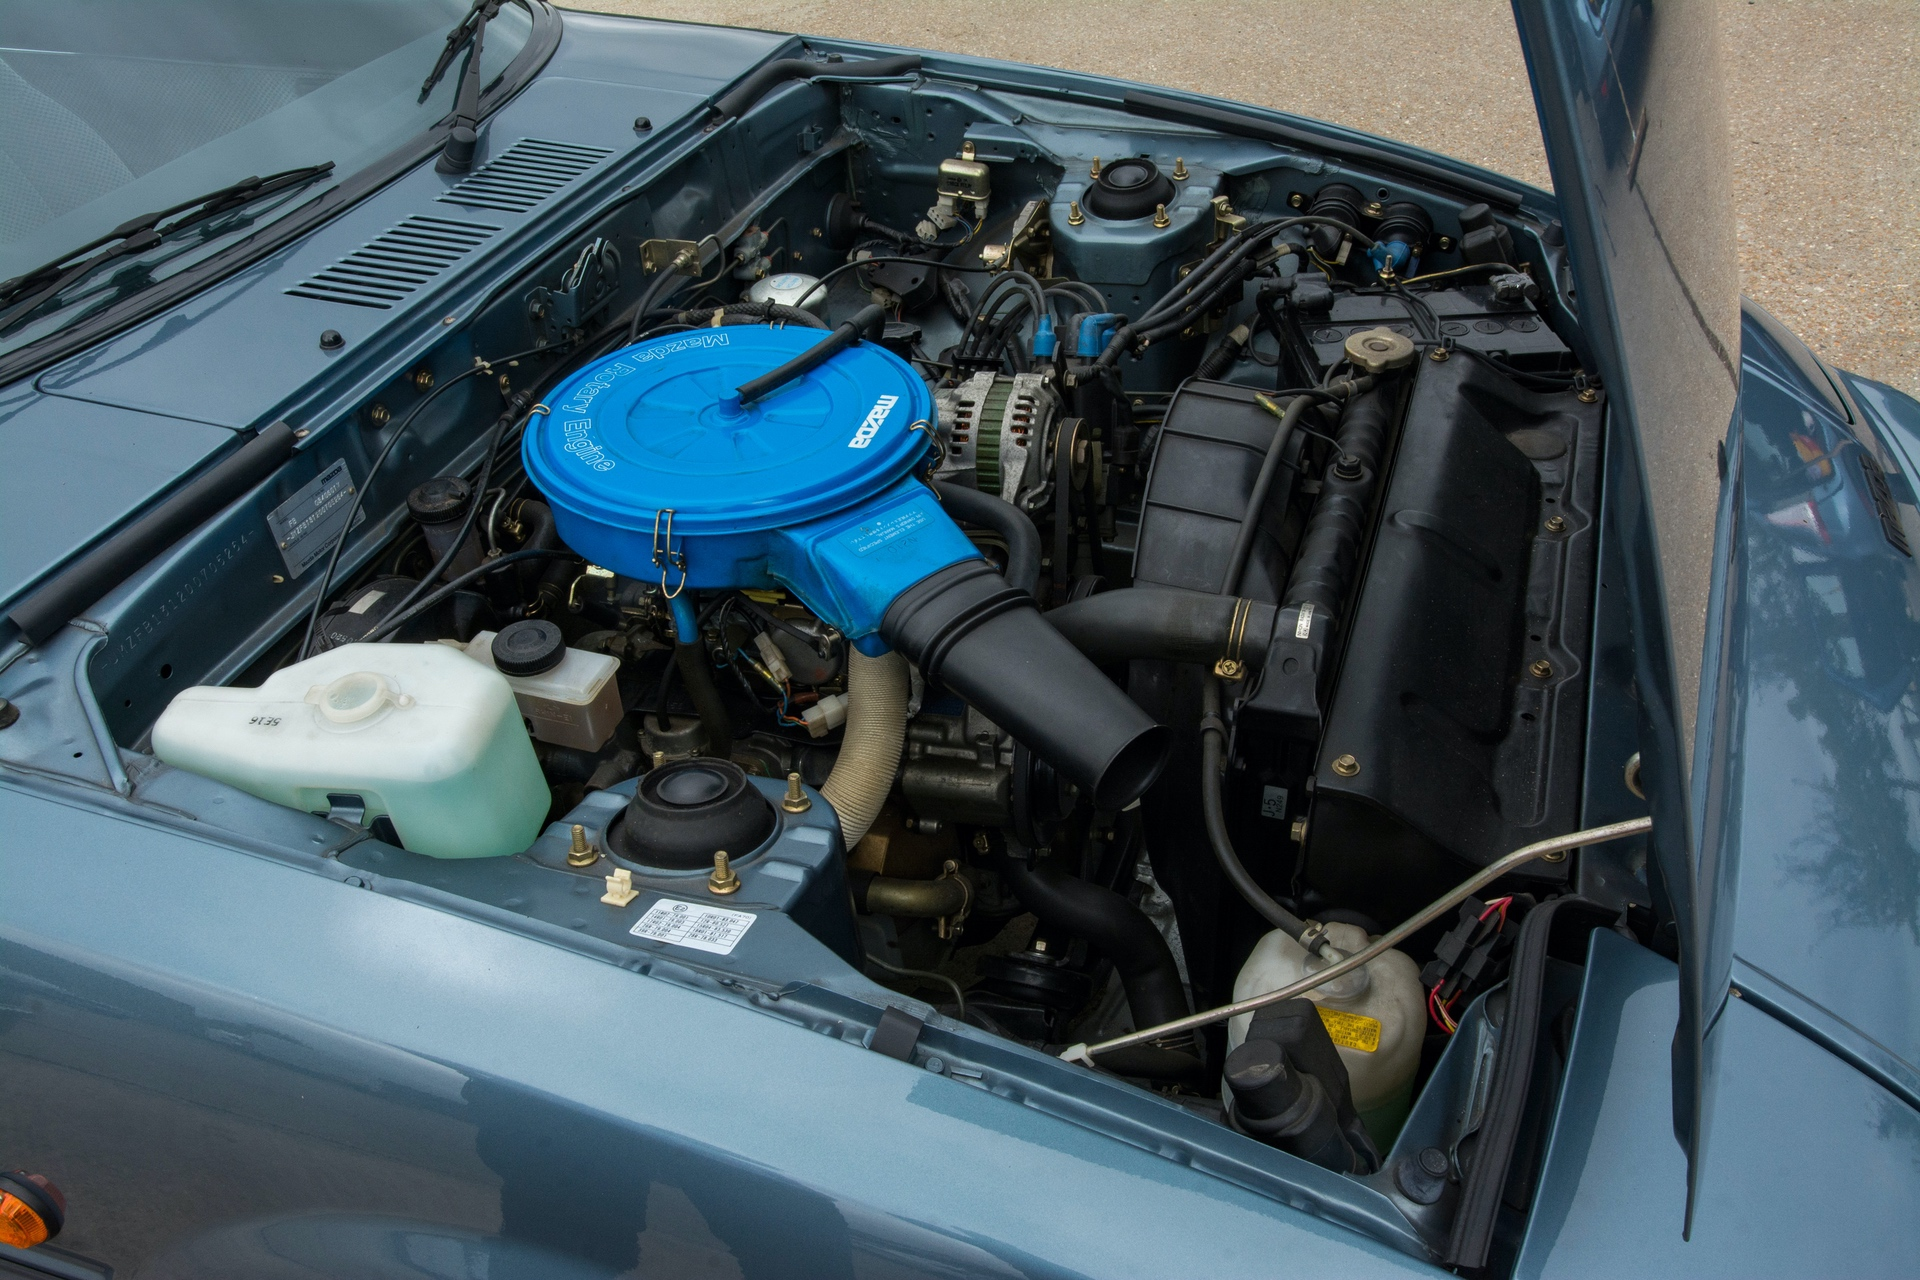 Mazda_RX-7_history_0043